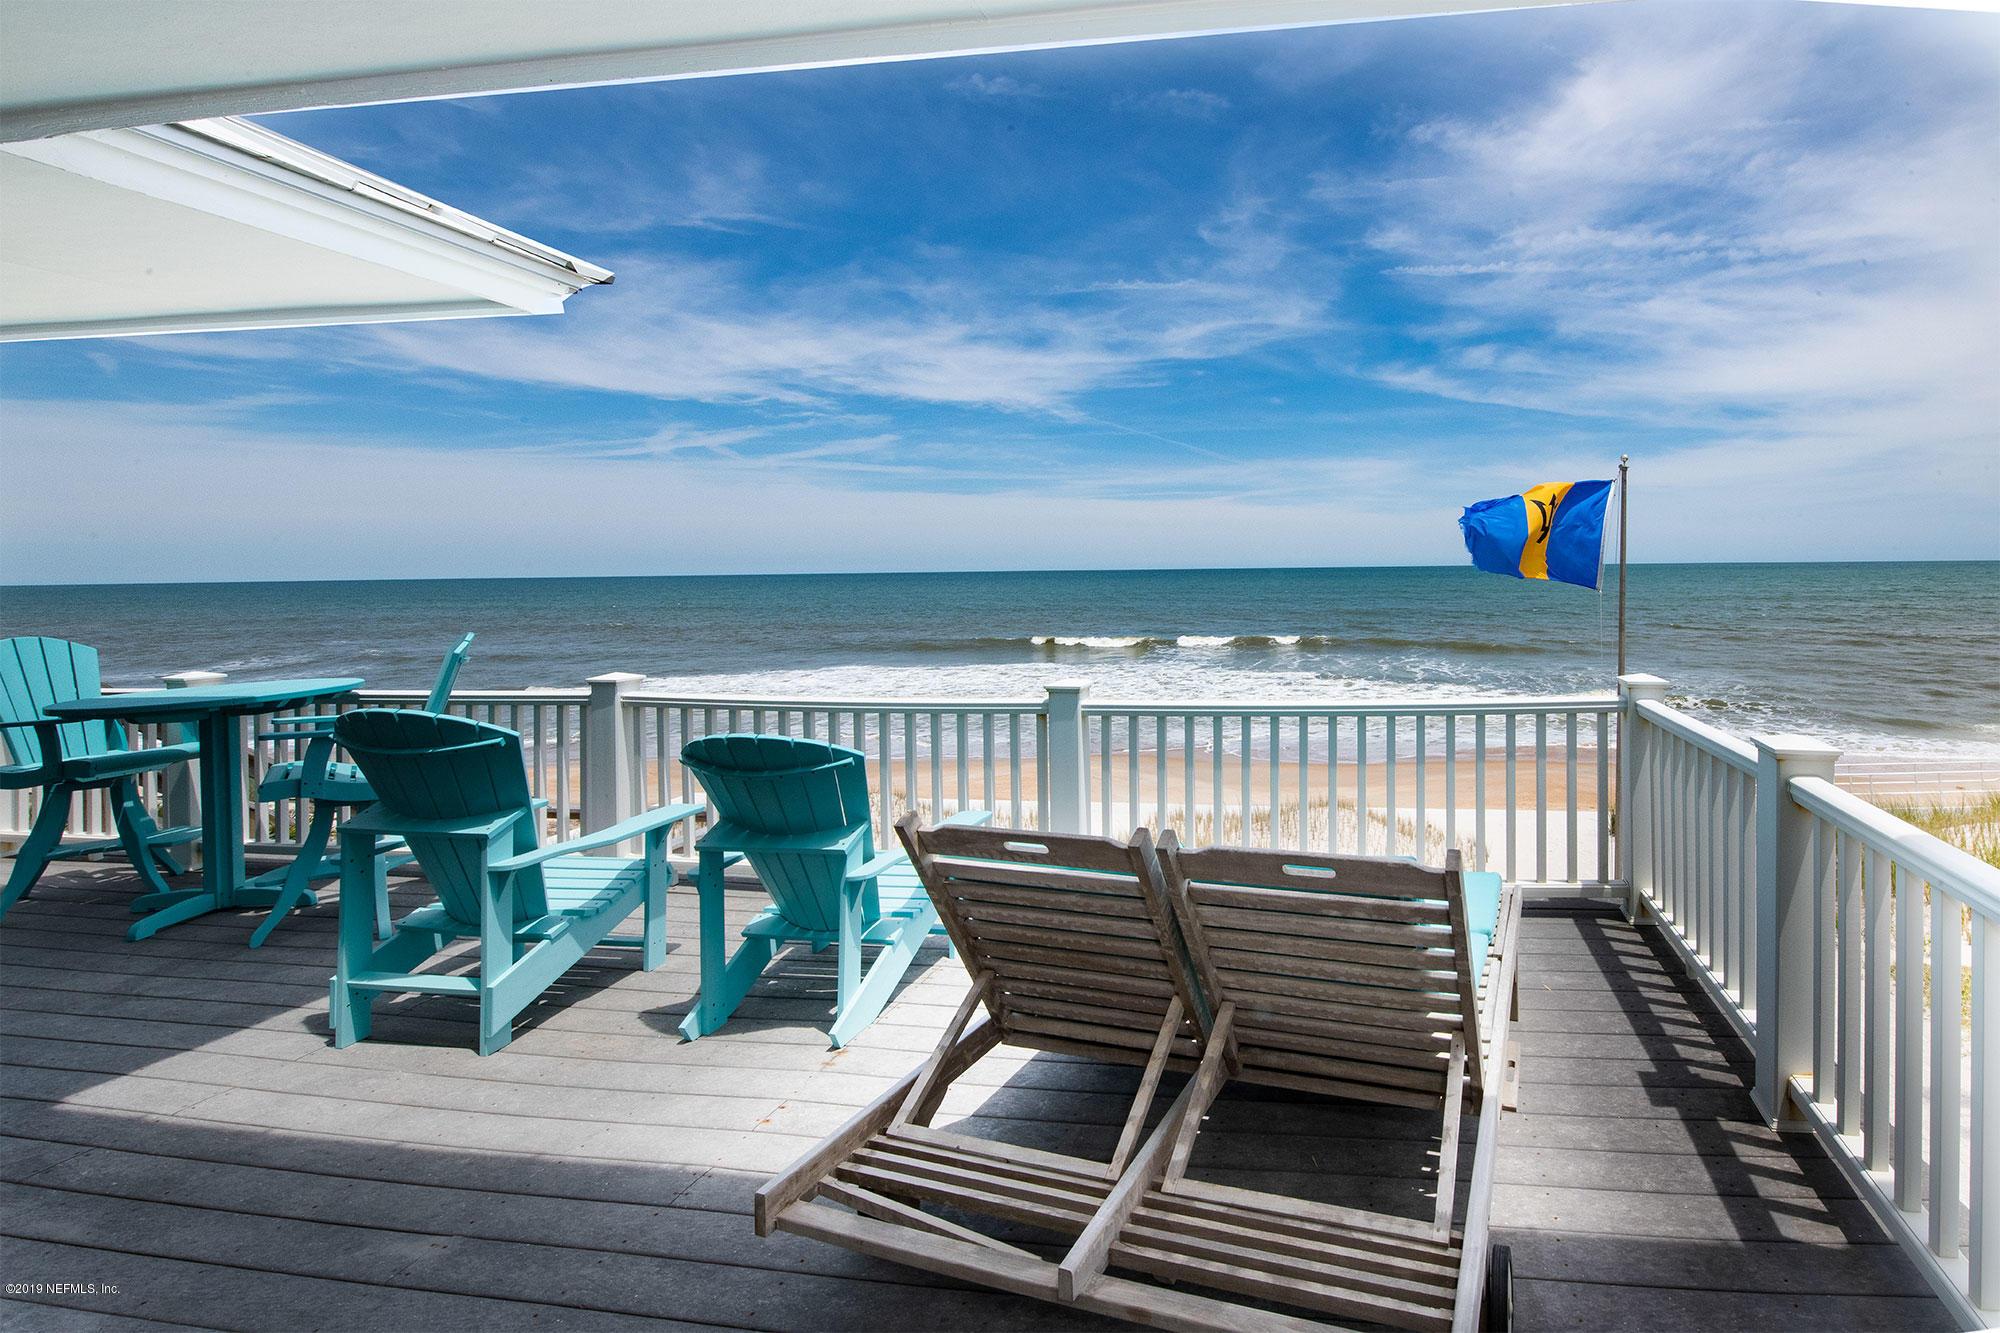 2903 PONTE VEDRA, PONTE VEDRA BEACH, FLORIDA 32082, 4 Bedrooms Bedrooms, ,3 BathroomsBathrooms,Residential,For sale,PONTE VEDRA,993034